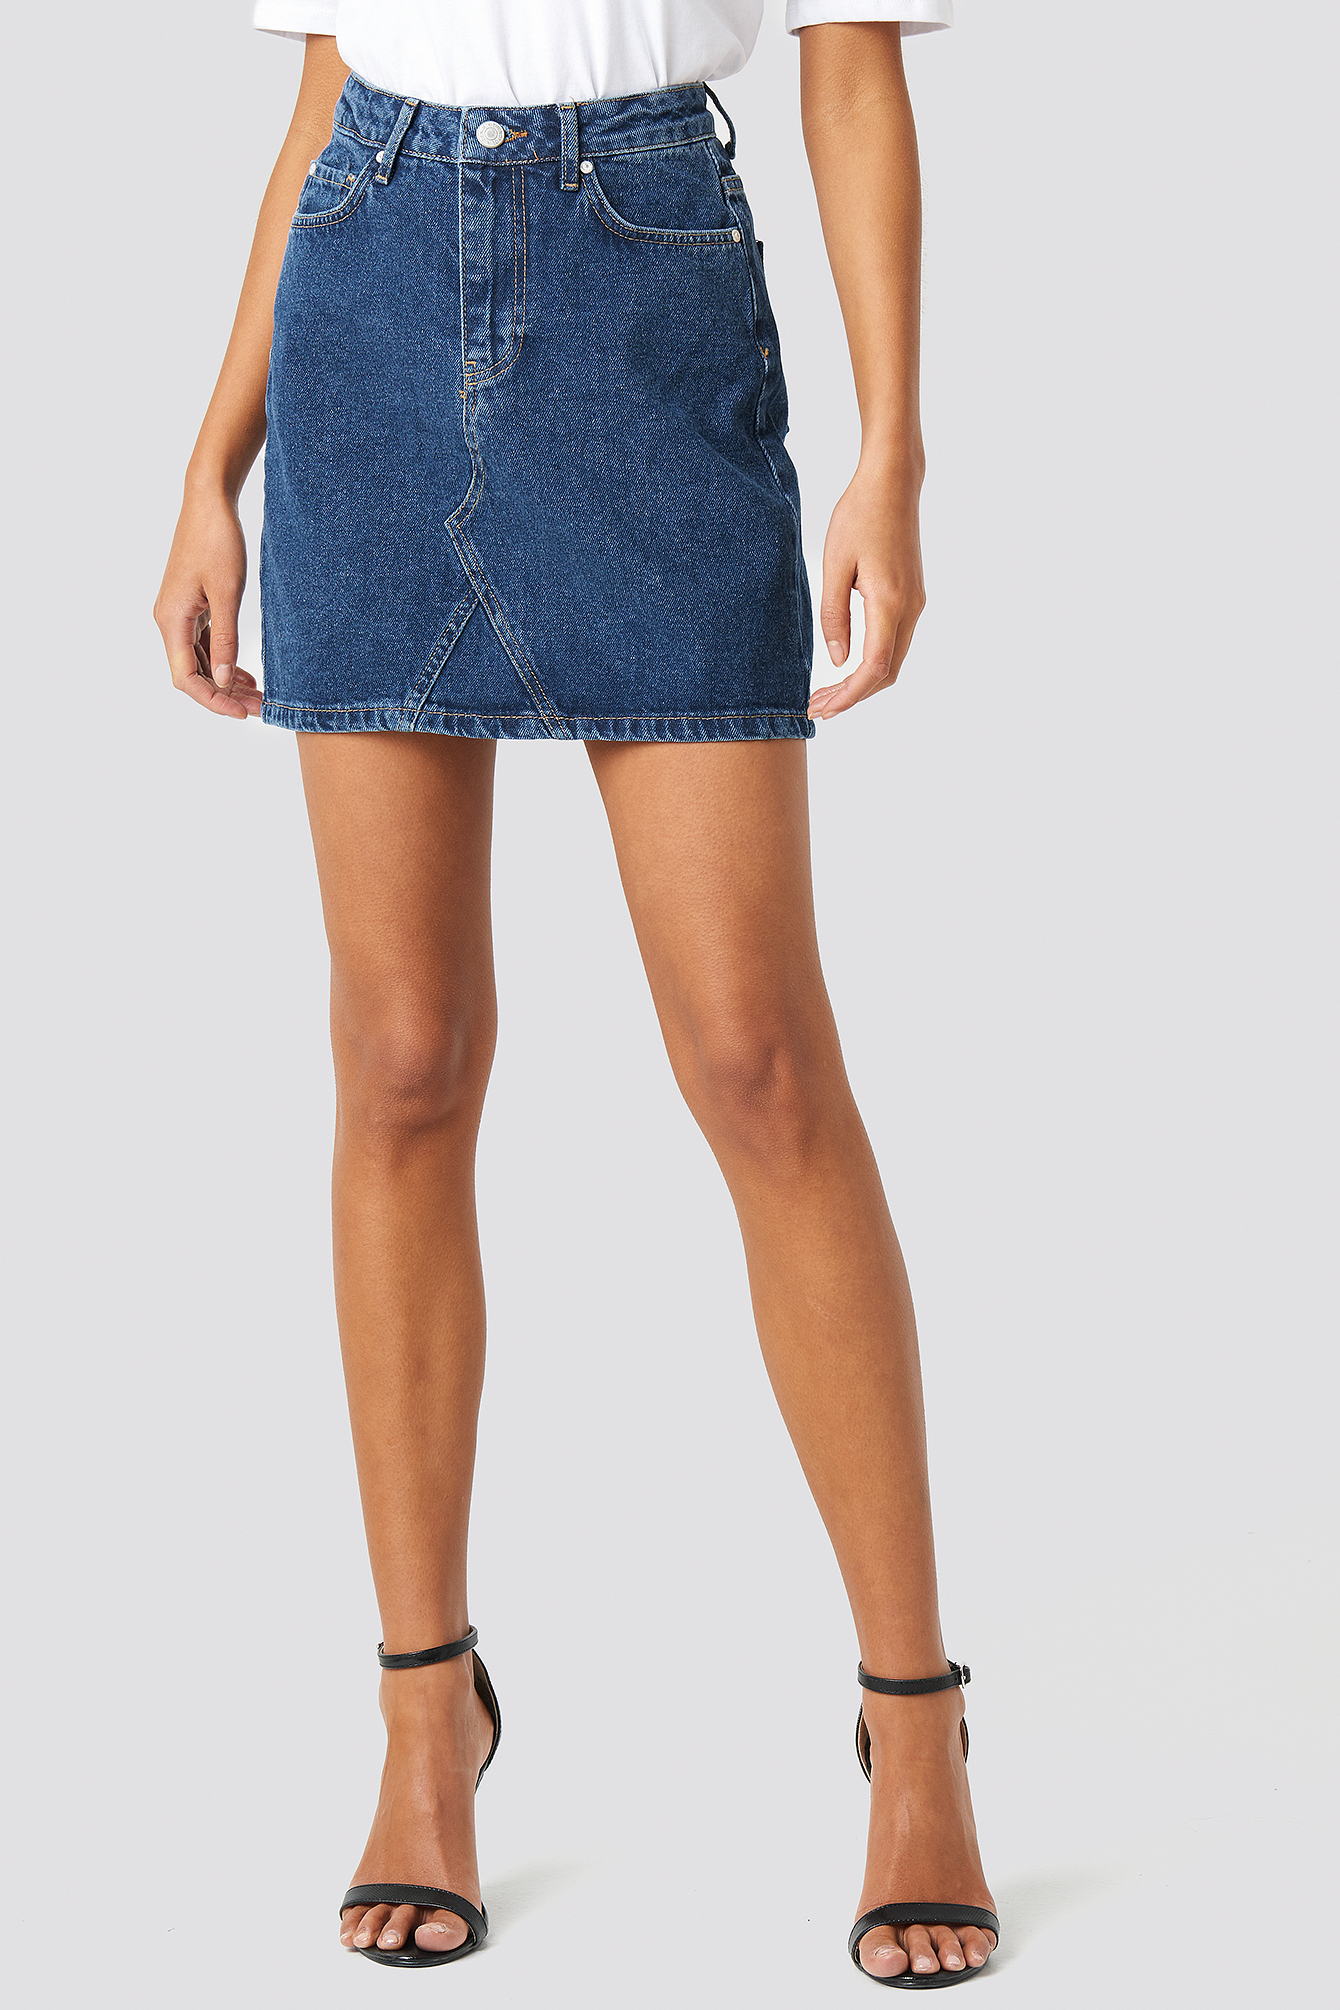 Milla Basic Denim Skirt NA-KD.COM